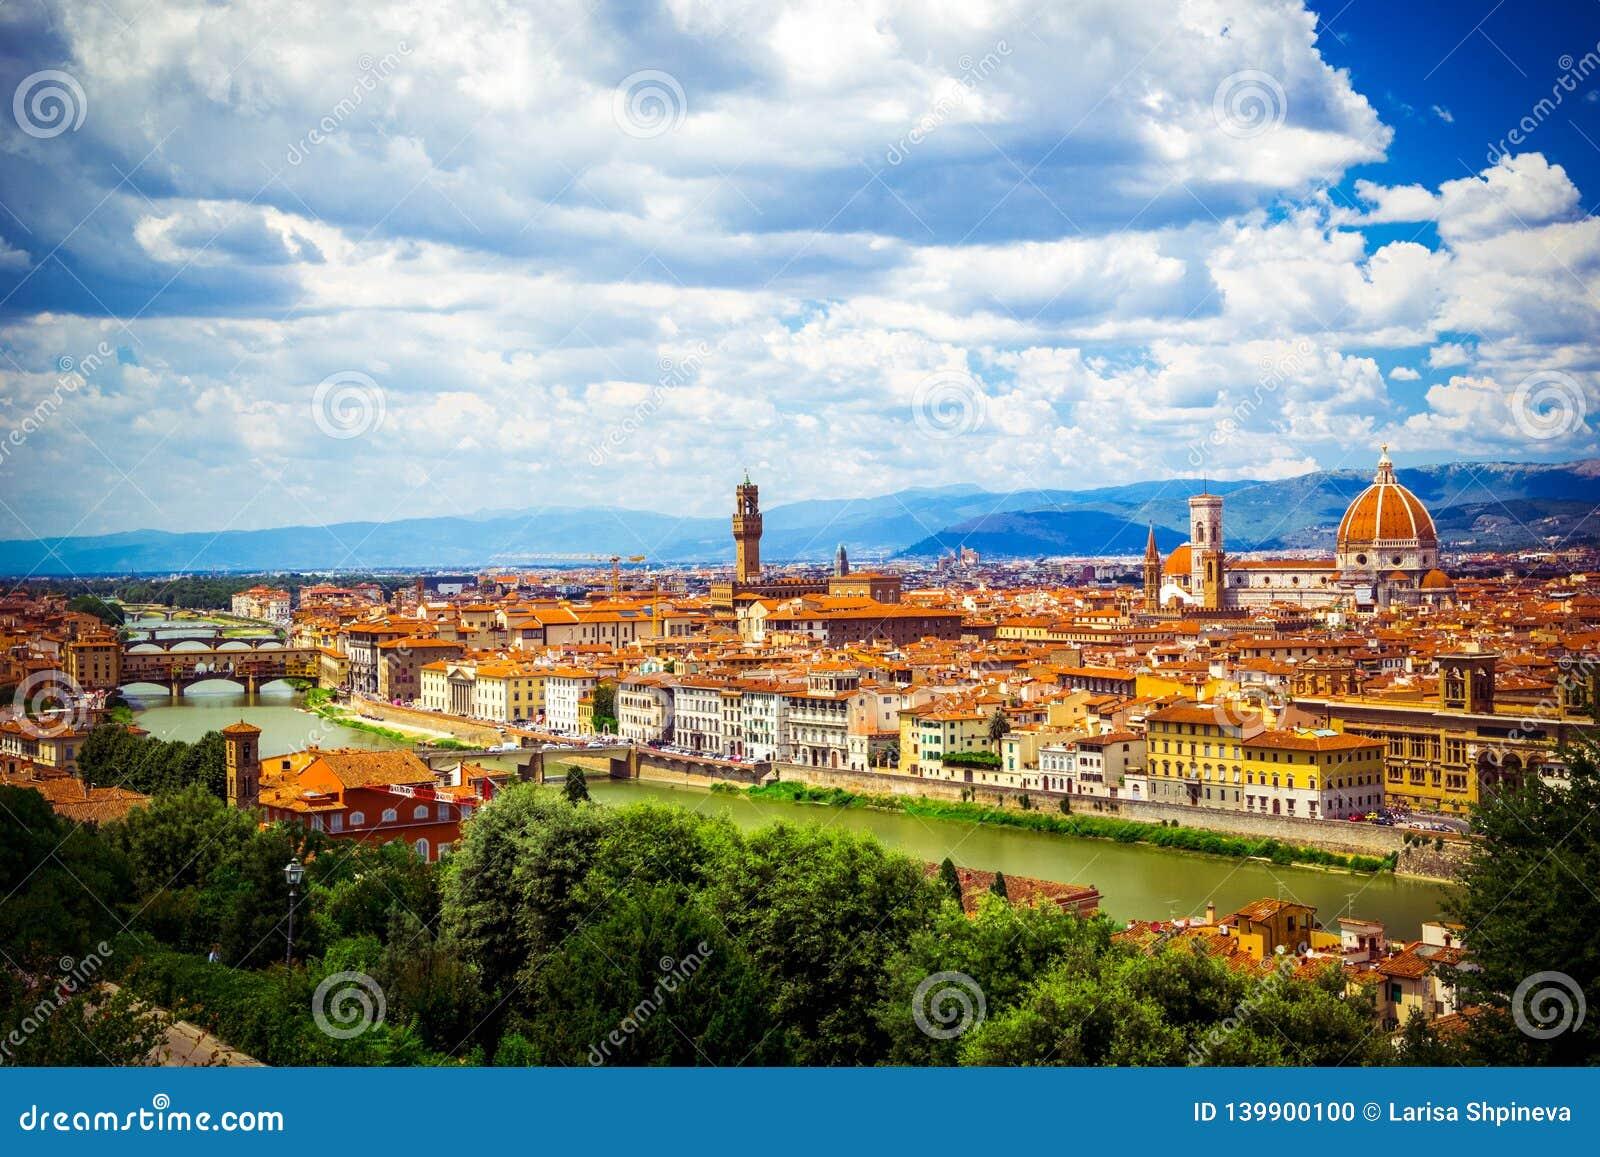 Modern kleurrijk satellietbeeld Florence Firenze op blauwe achtergrond Beroemde Europese reisbestemming Mooie architectuur italia